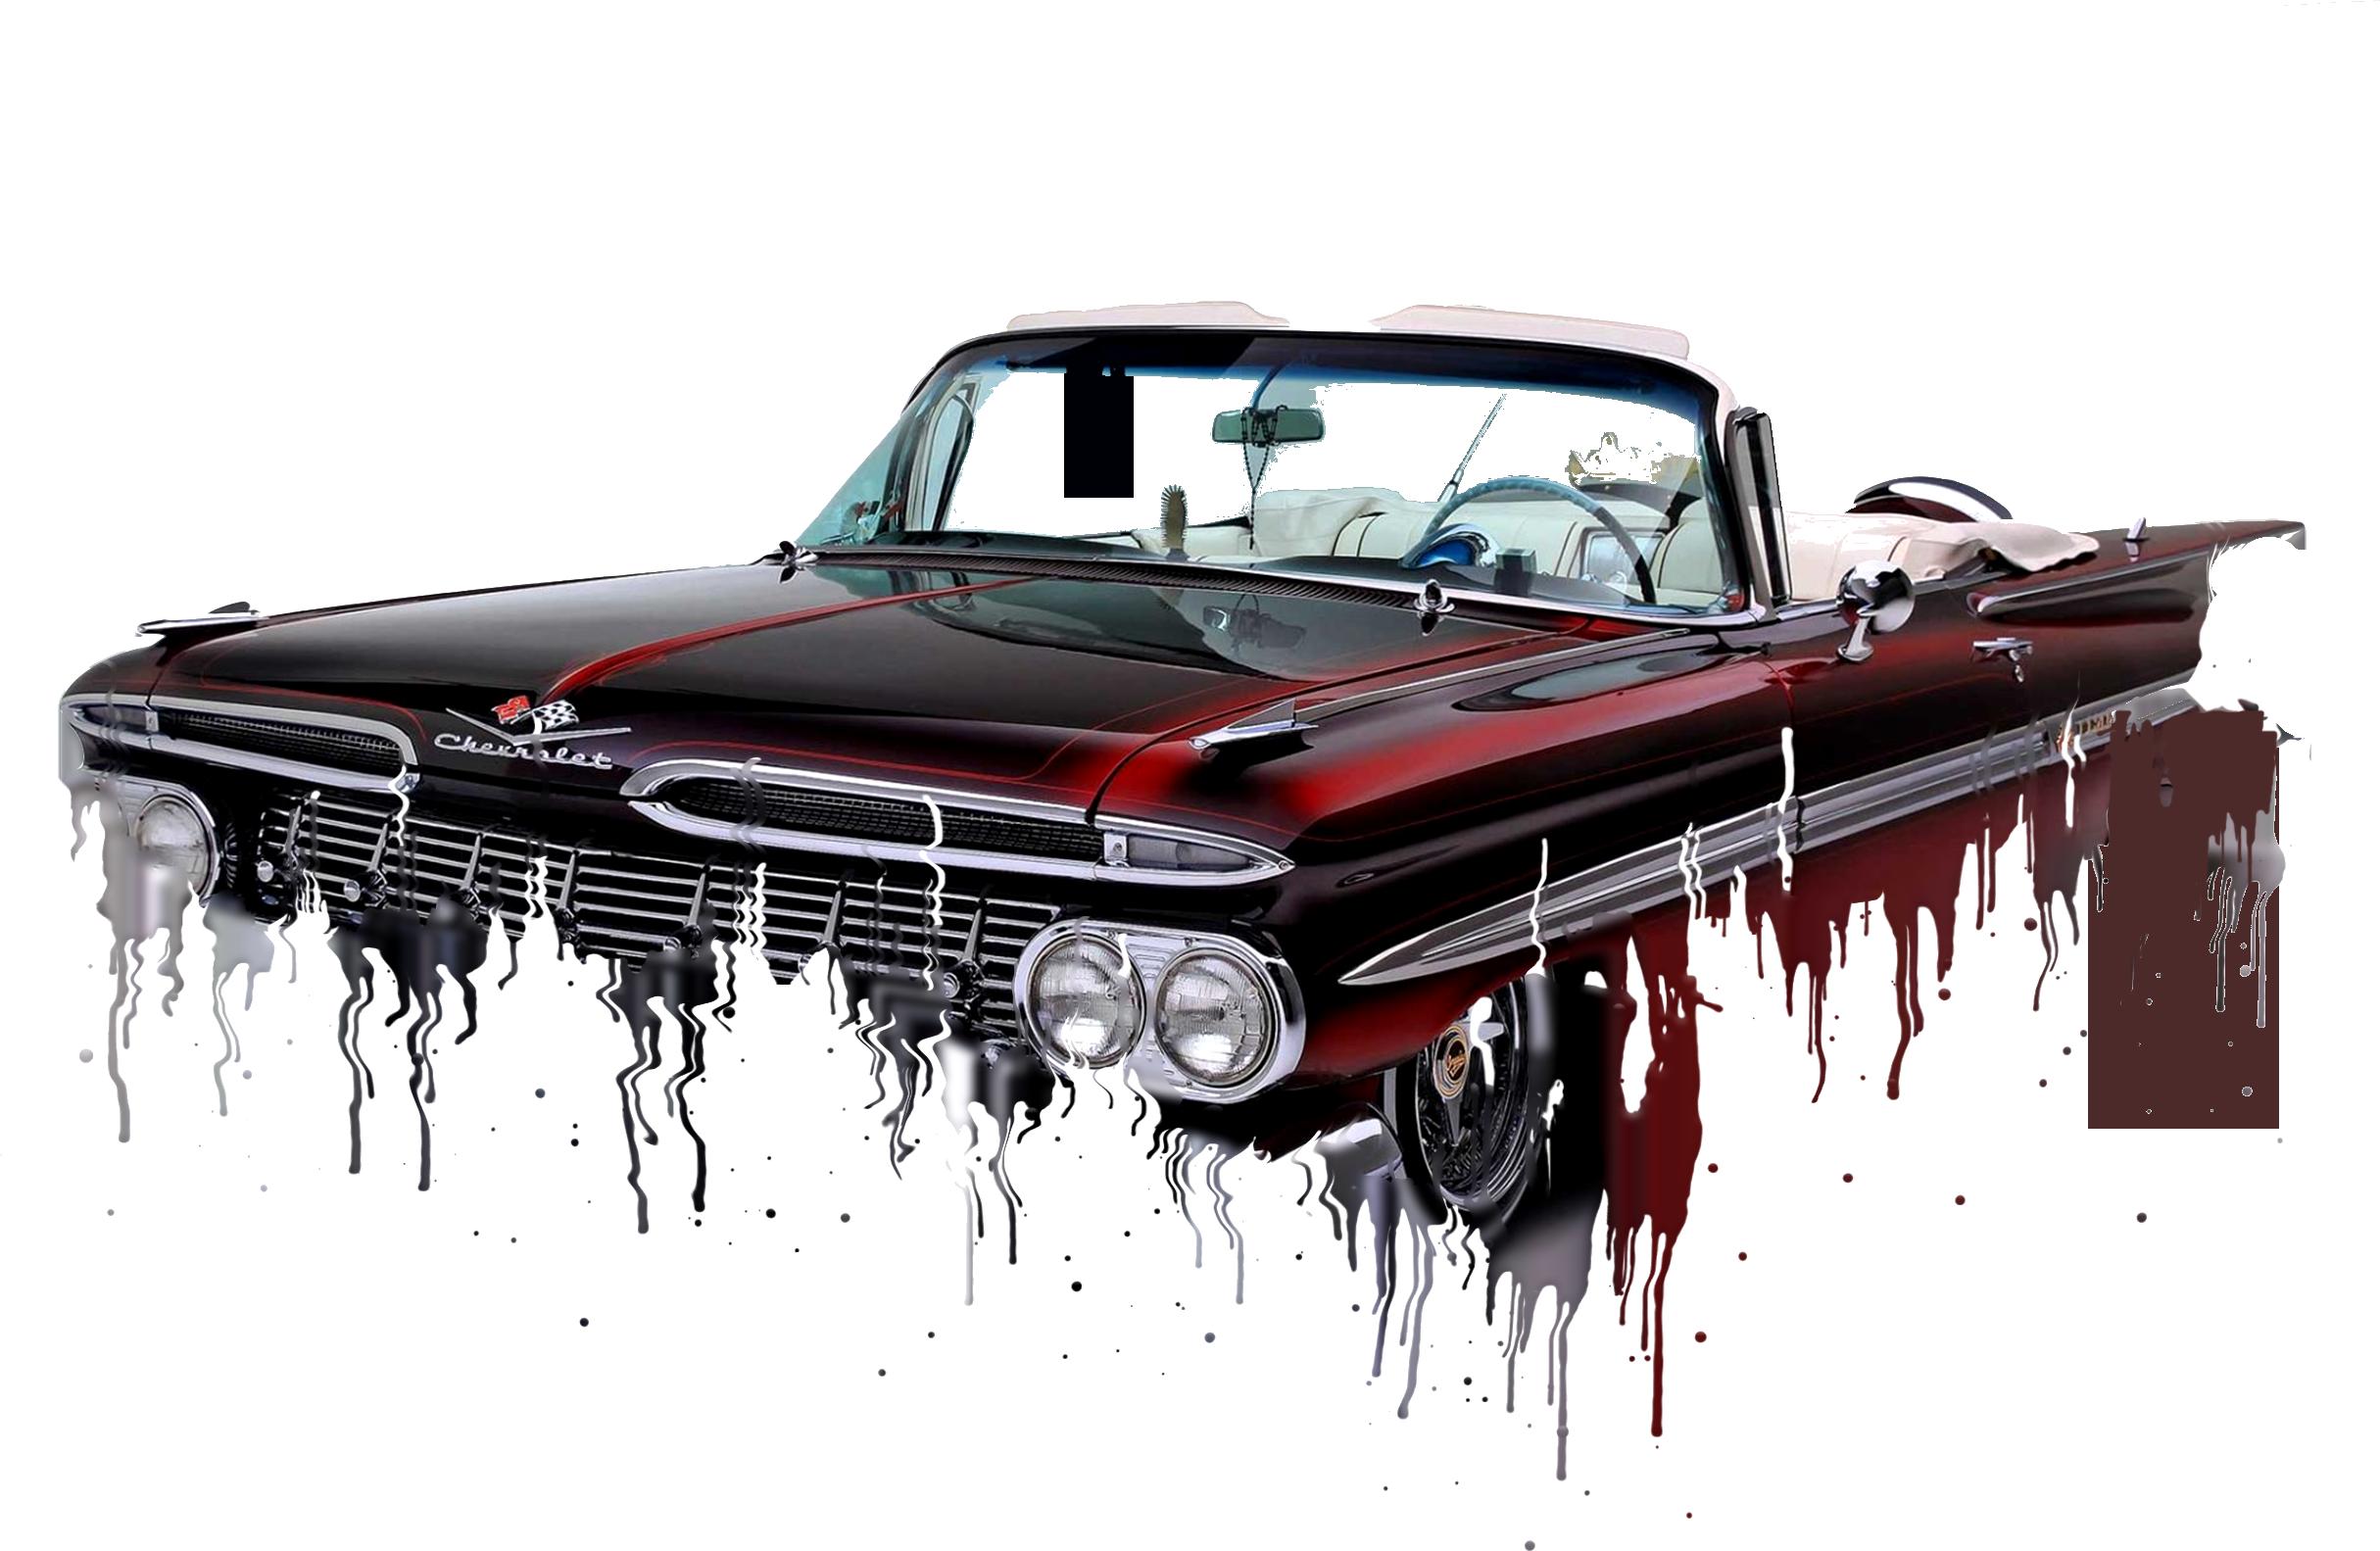 Chevrolet Impala Liquid Metal